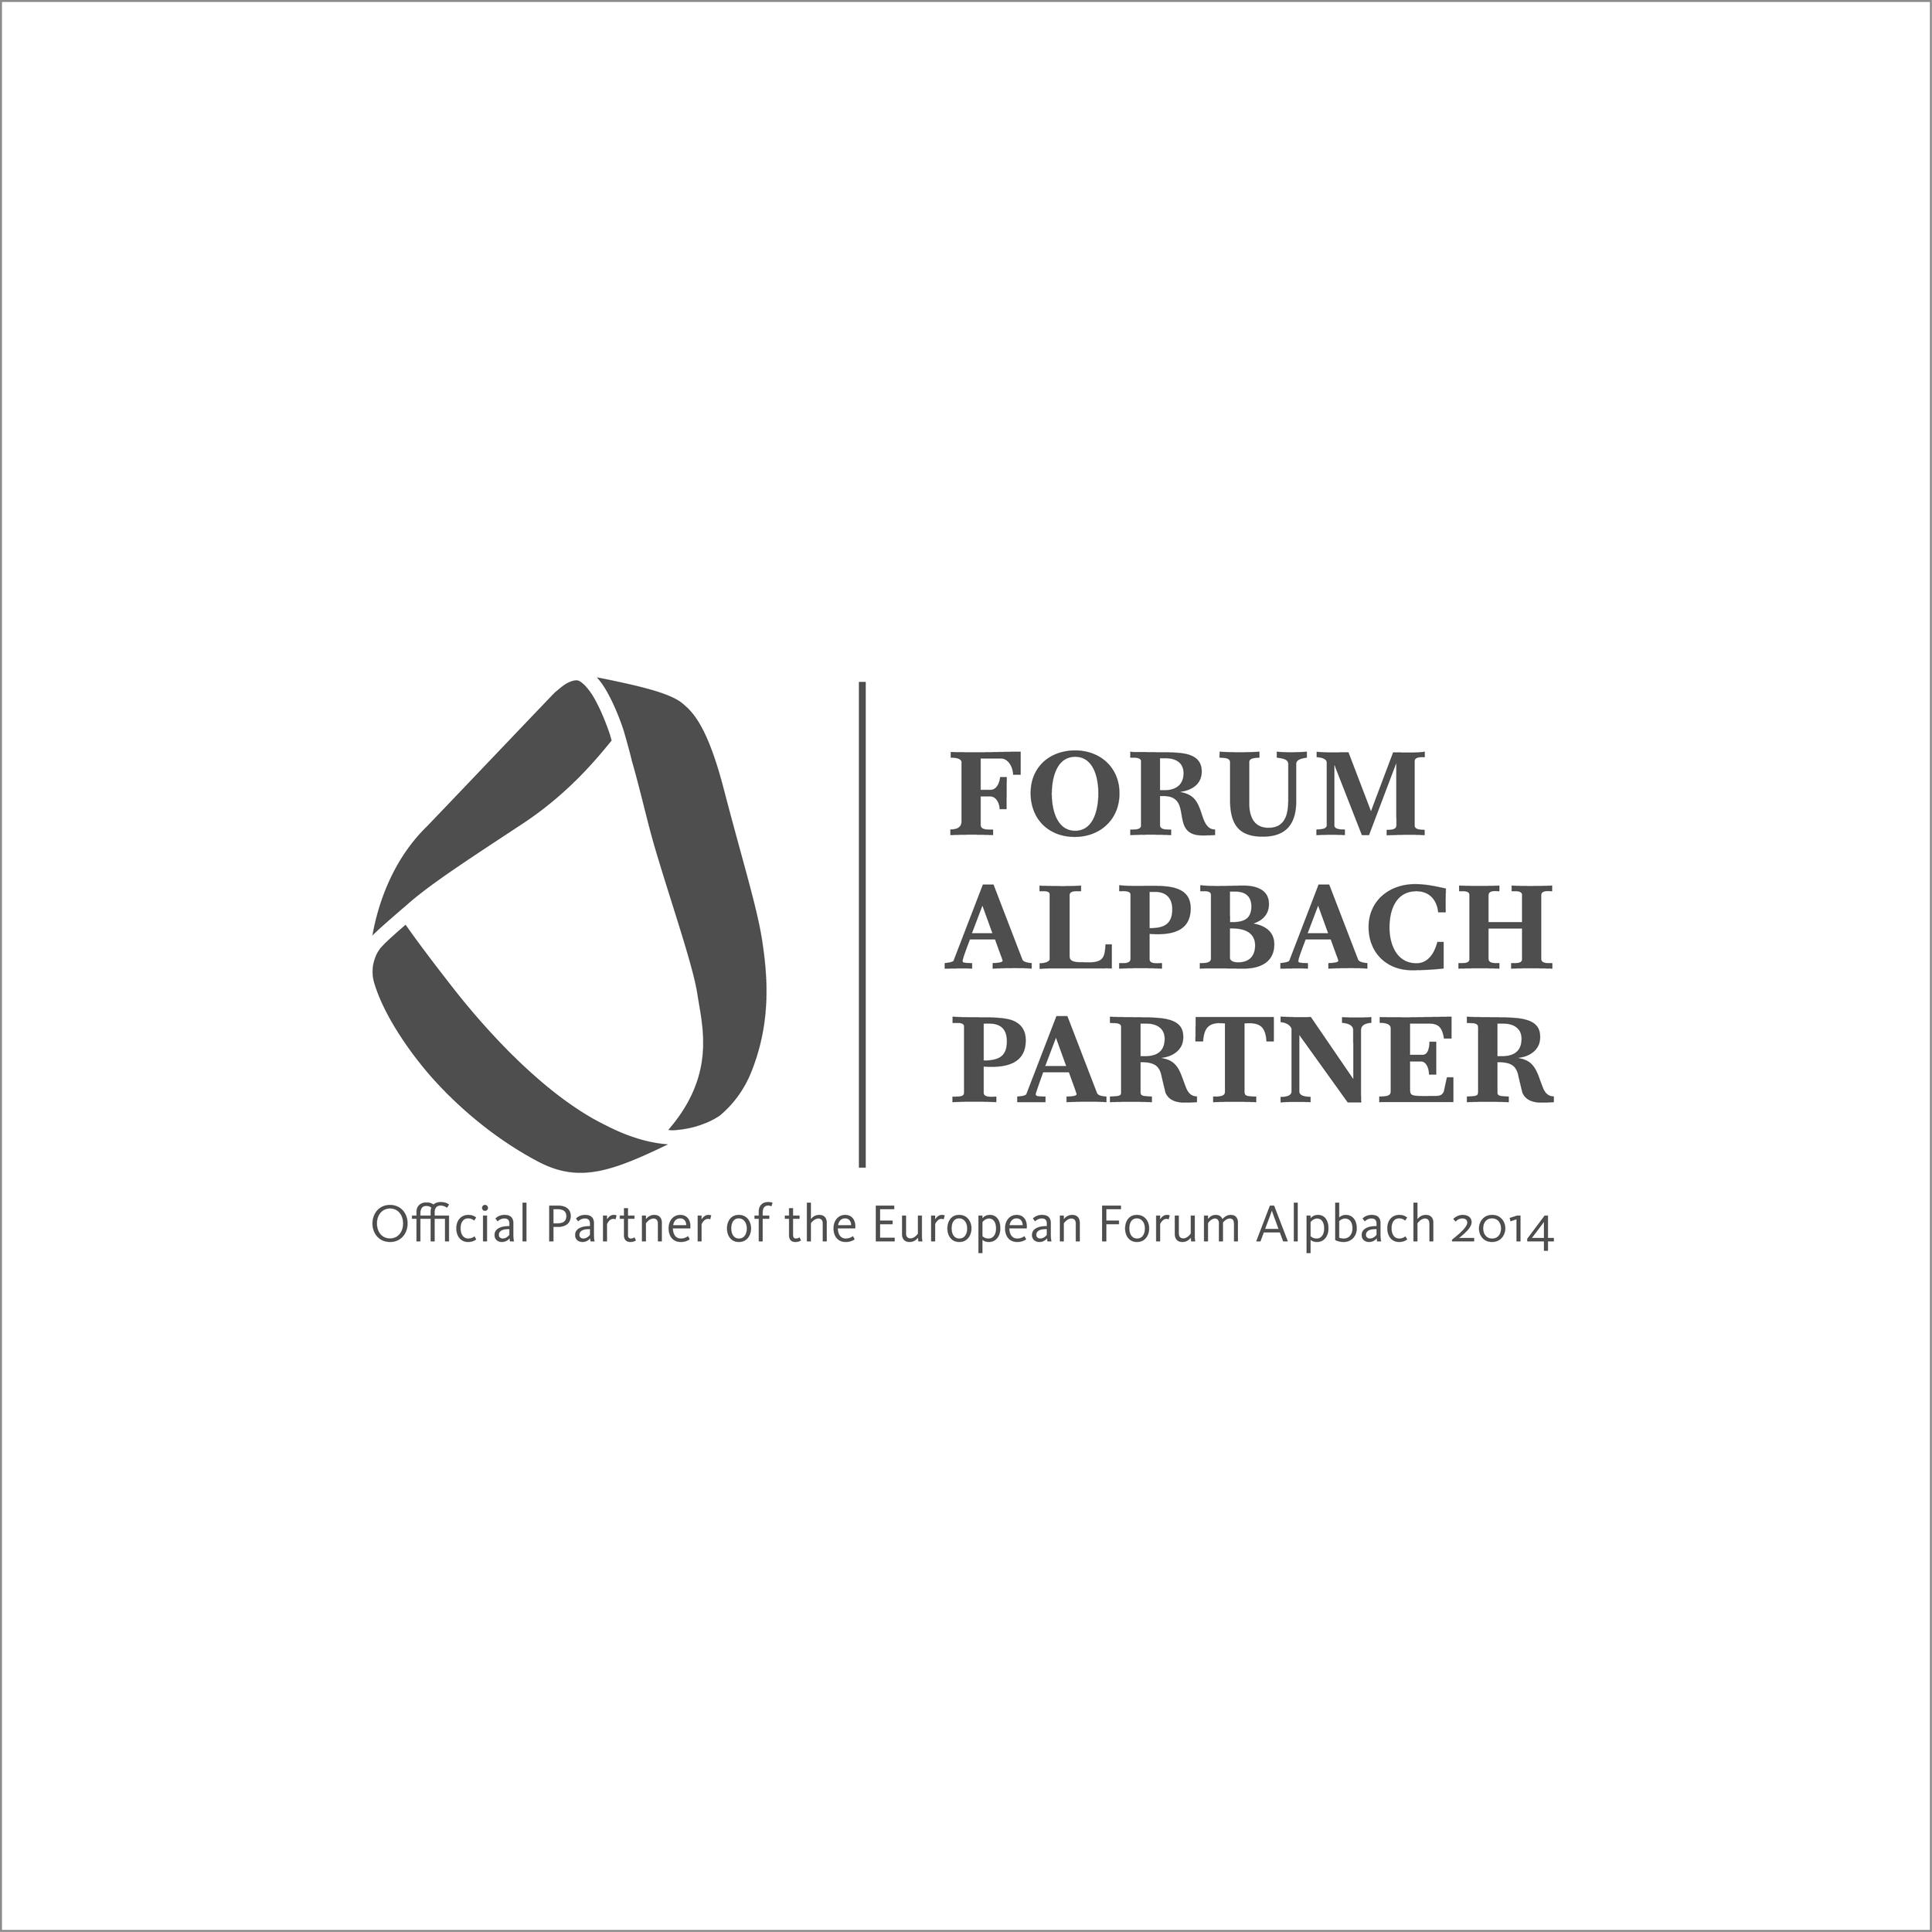 referenze_ForumAlpbach_001.1.jpg